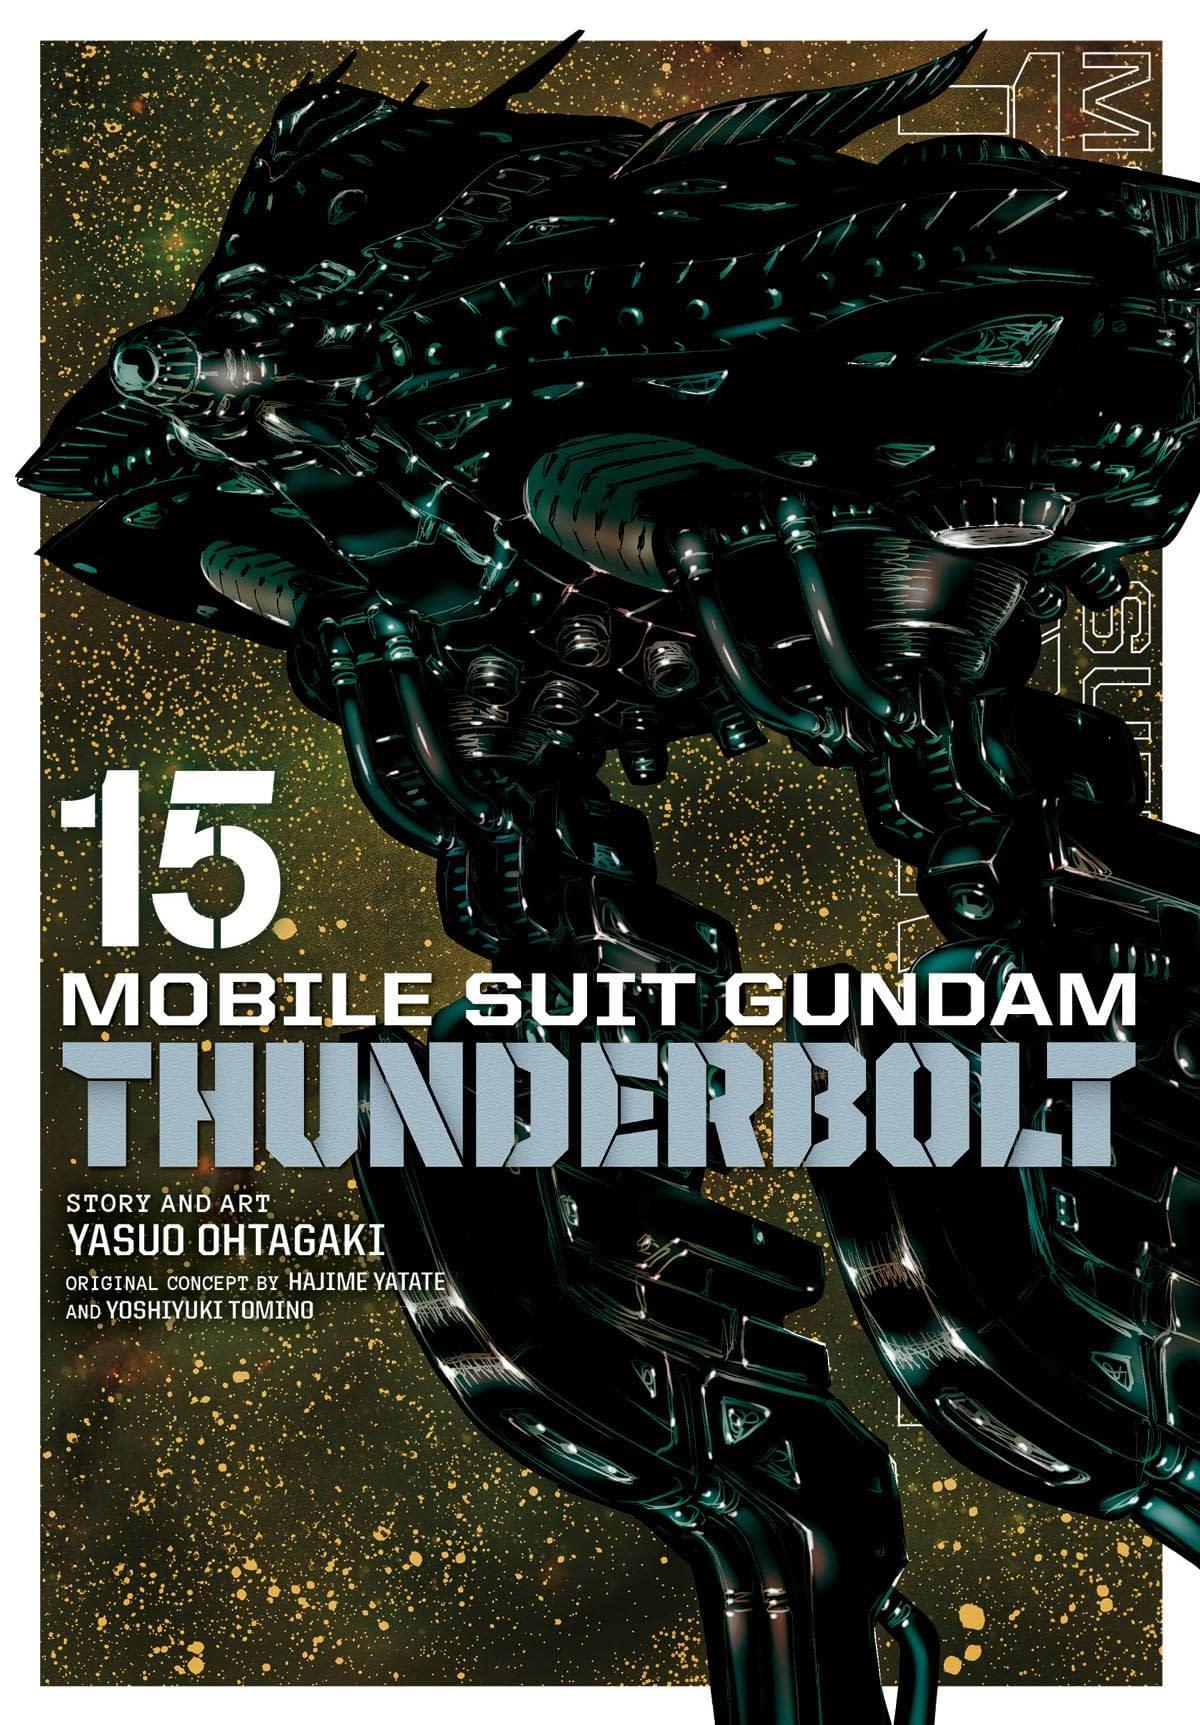 MOBILE SUIT GUNDAM THUNDERBOLT GN VOL 15